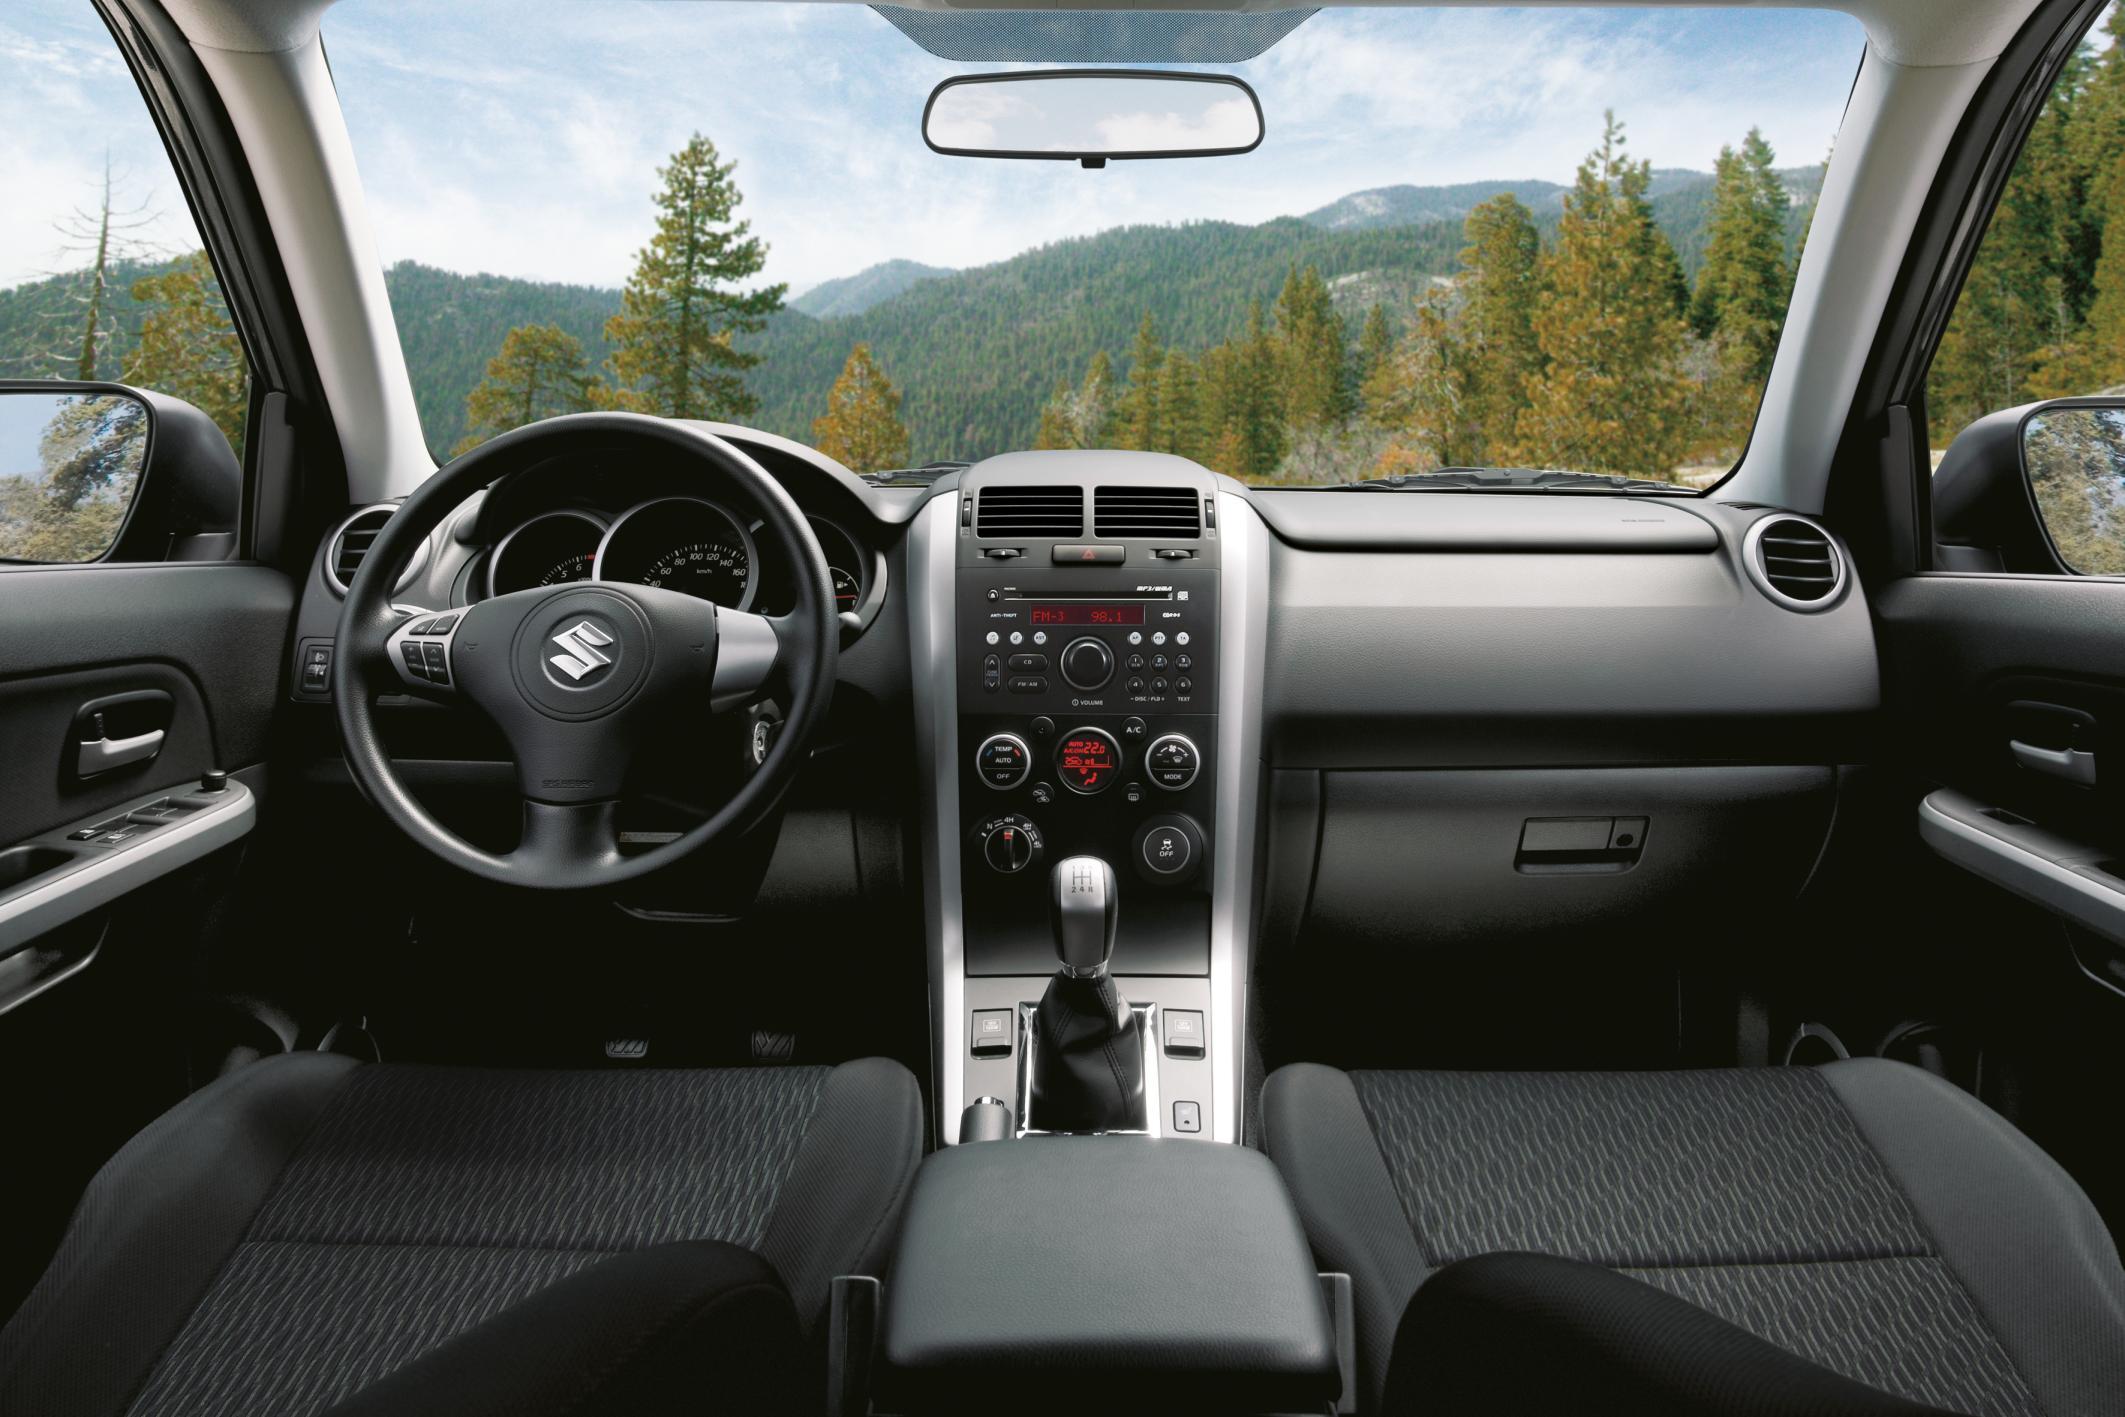 Suzuki Grand Vitara Innenraum Alternative Mit Stoffsitzen Foto